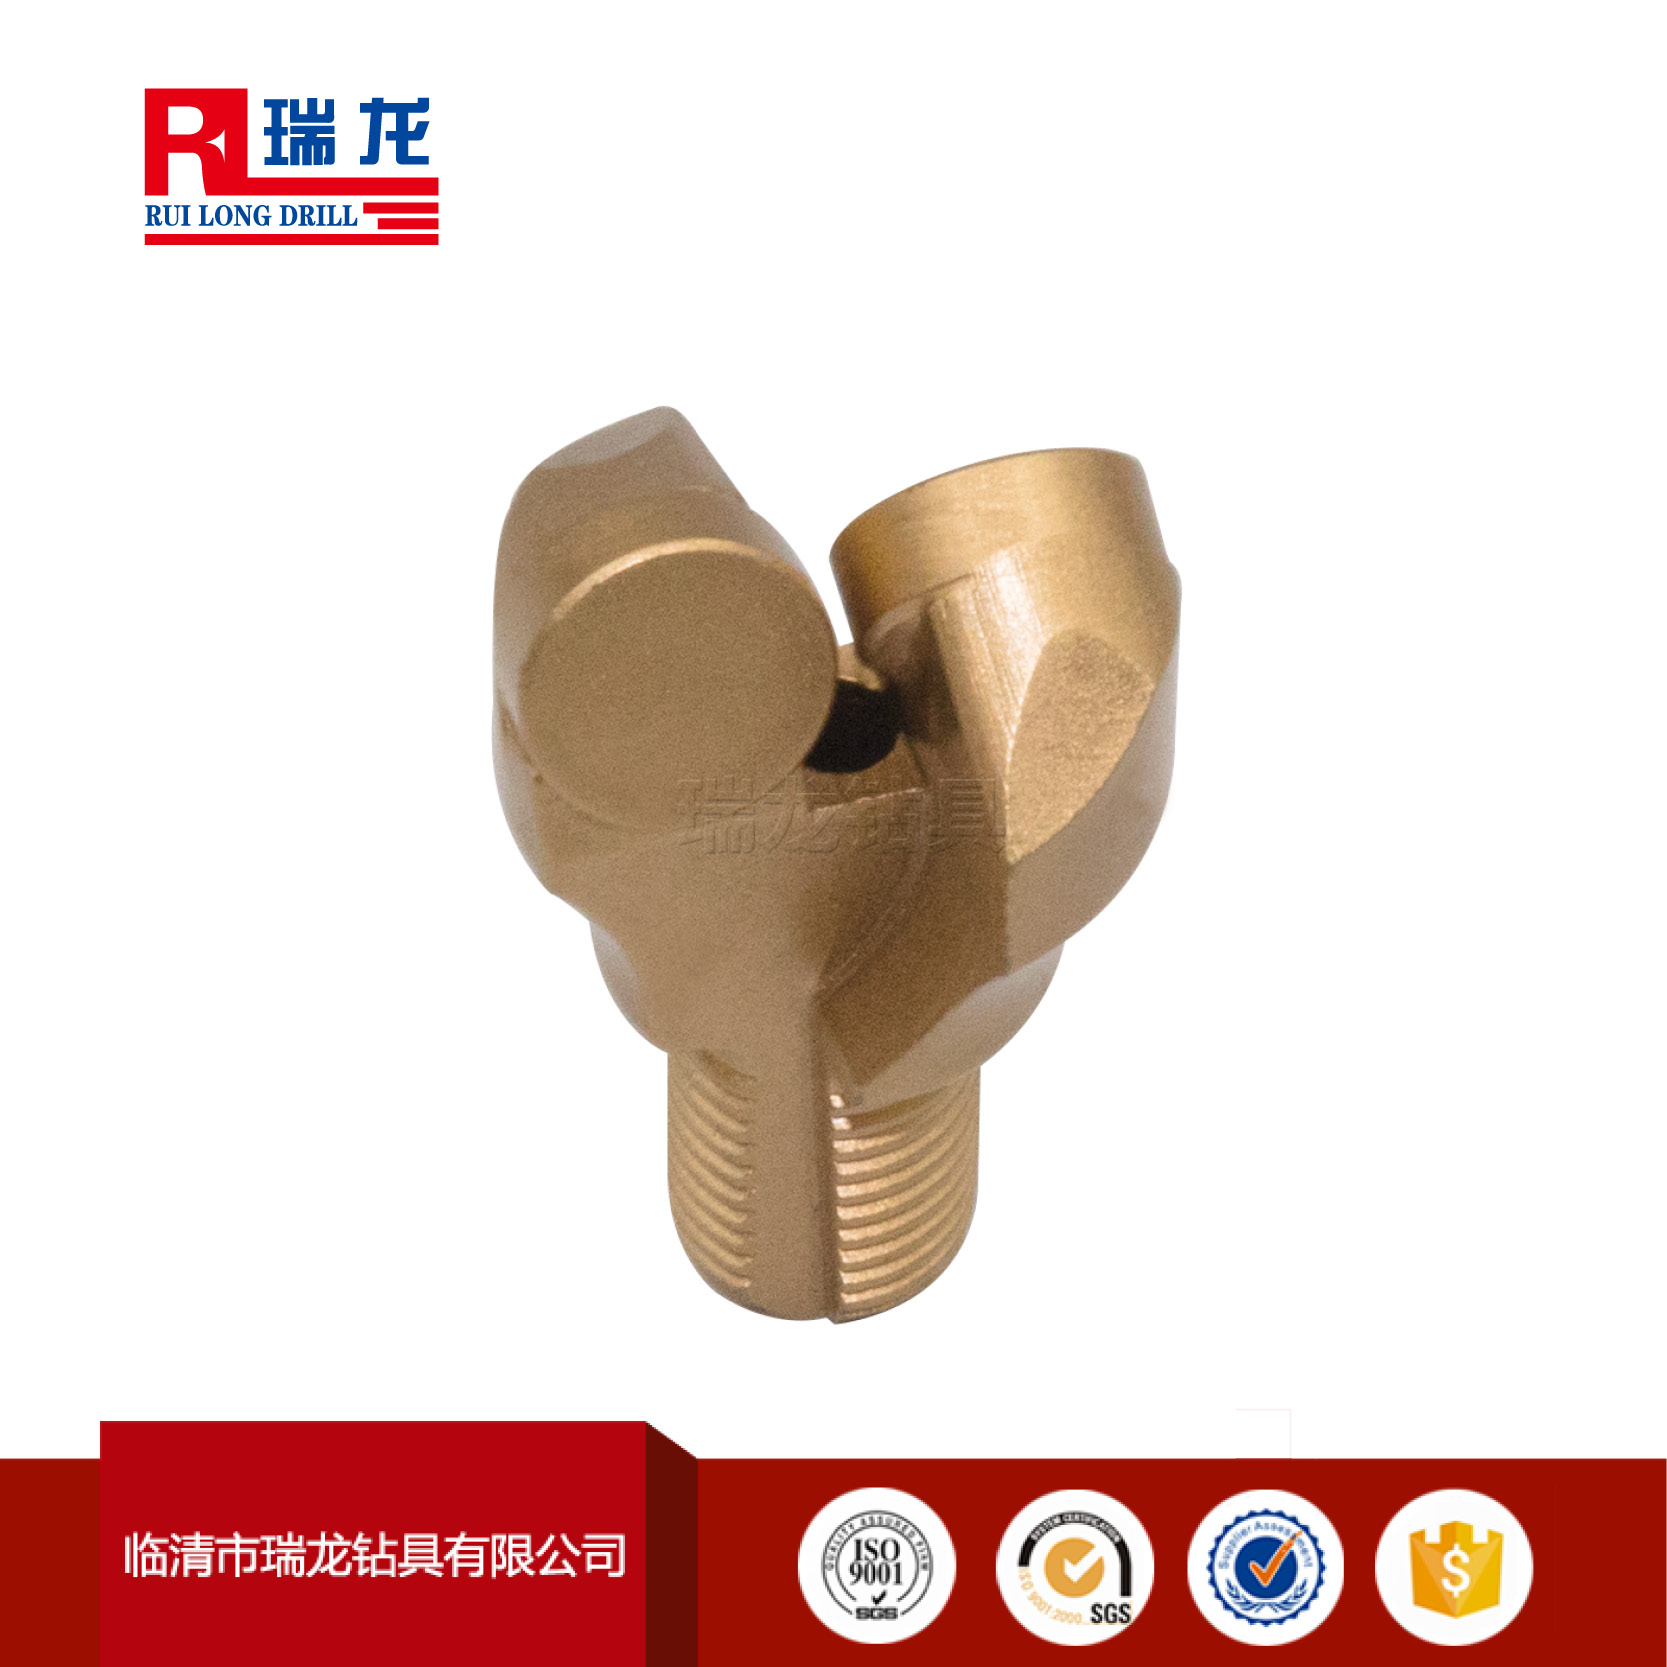 φ28-M14*1.5金刚石锚杆钻头瑞龙钻具(全片)